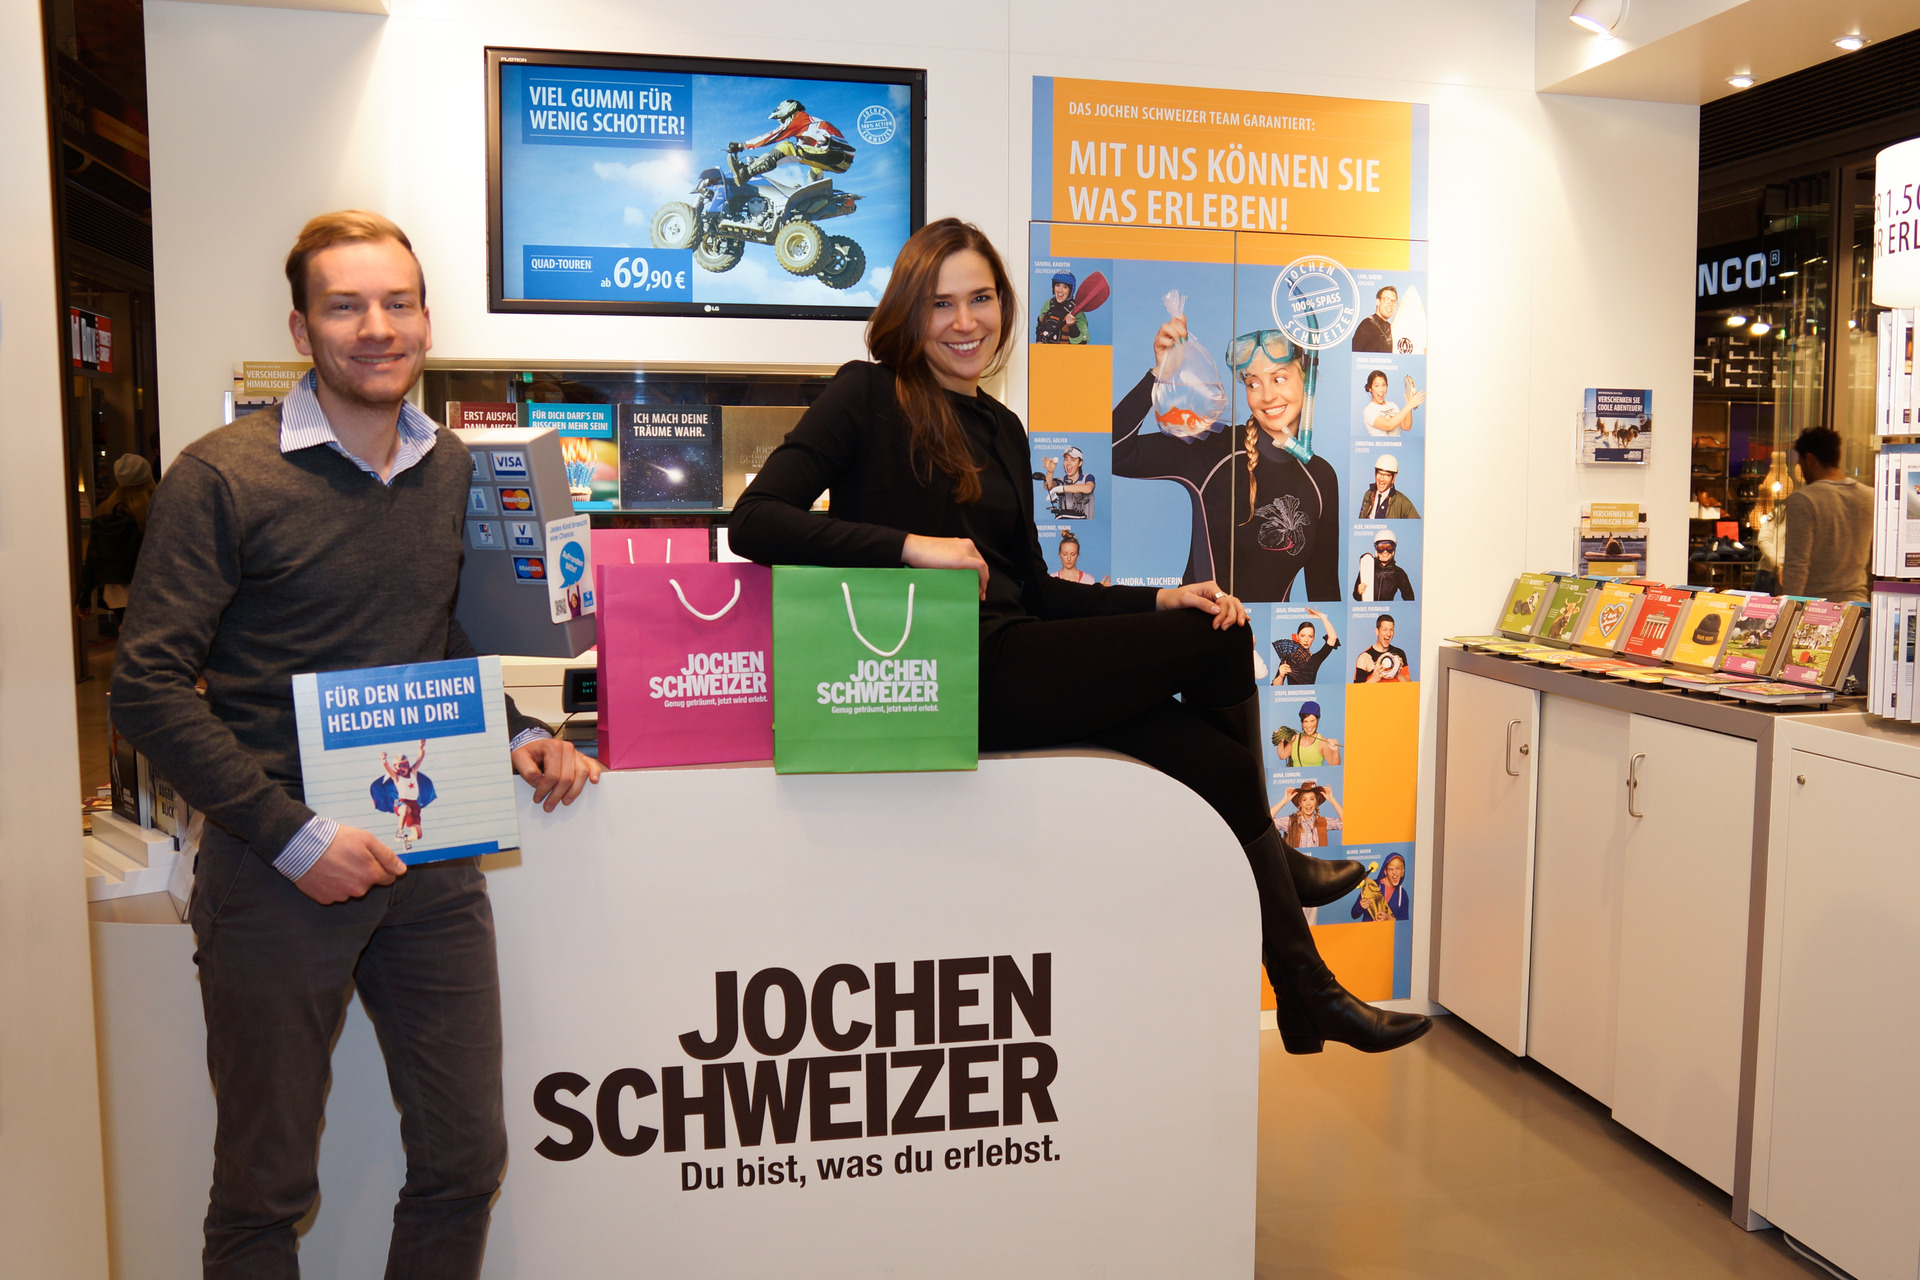 Jochen Schwe